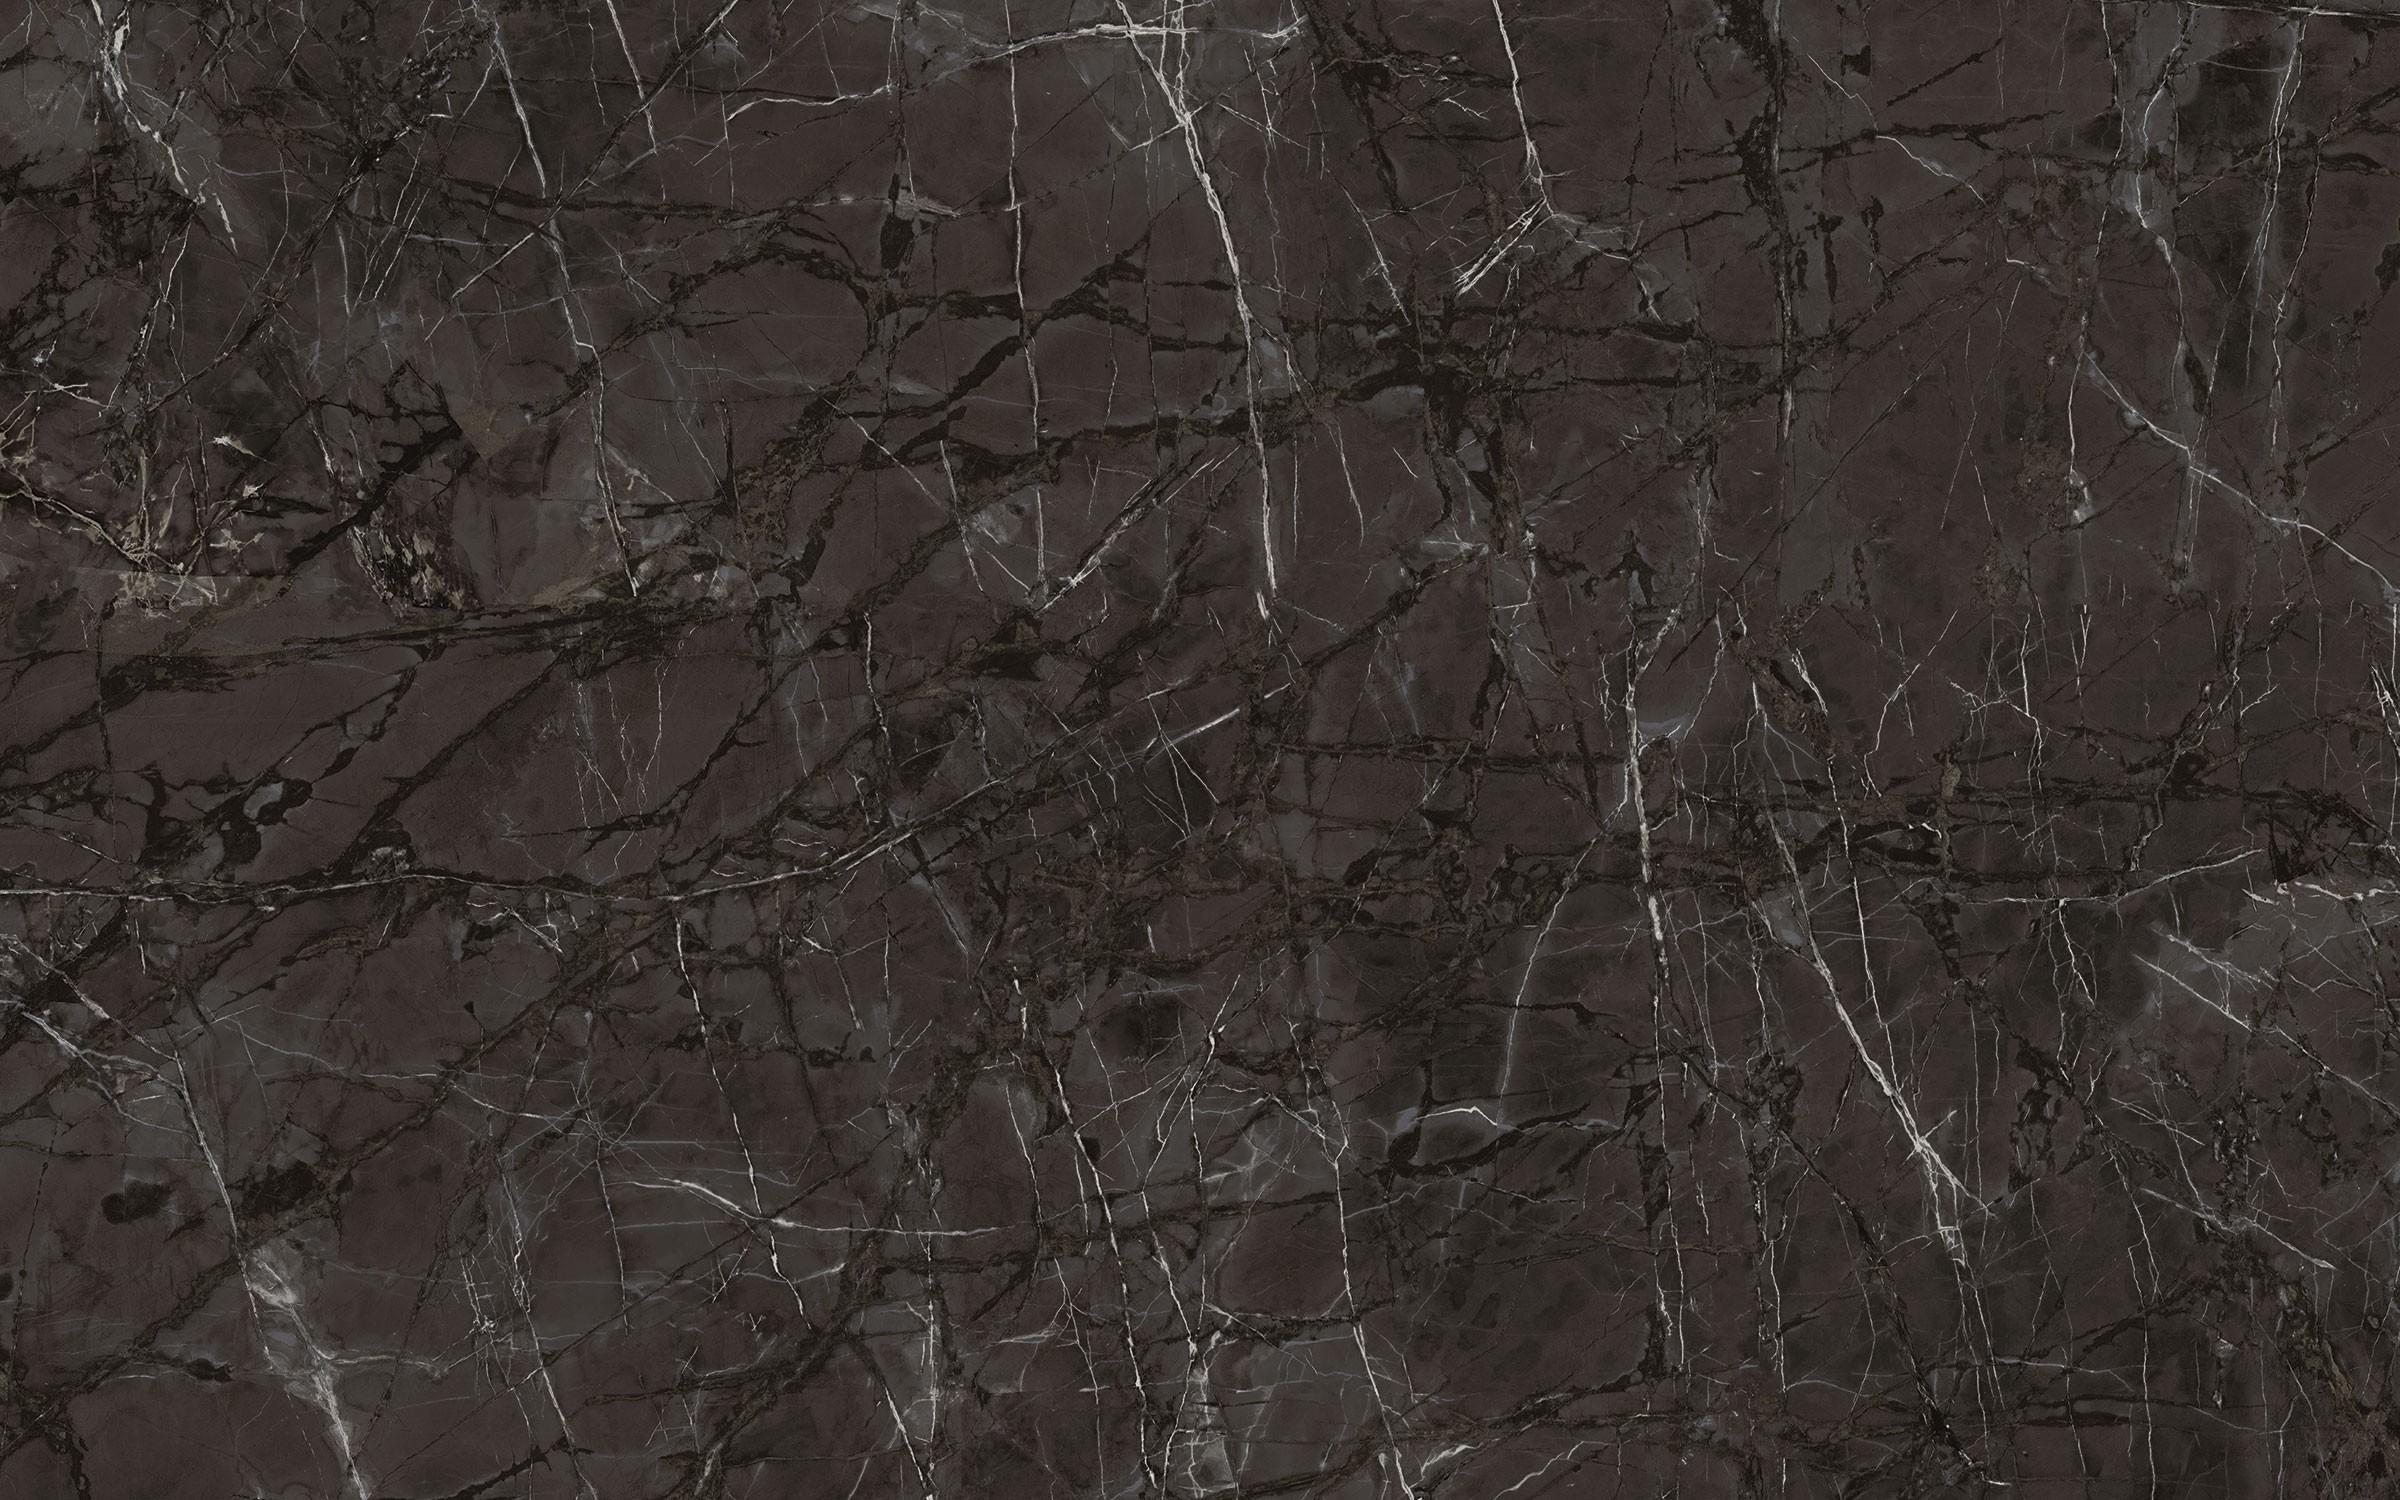 5006K COTE DAZUR NOIR  Laminate Countertops